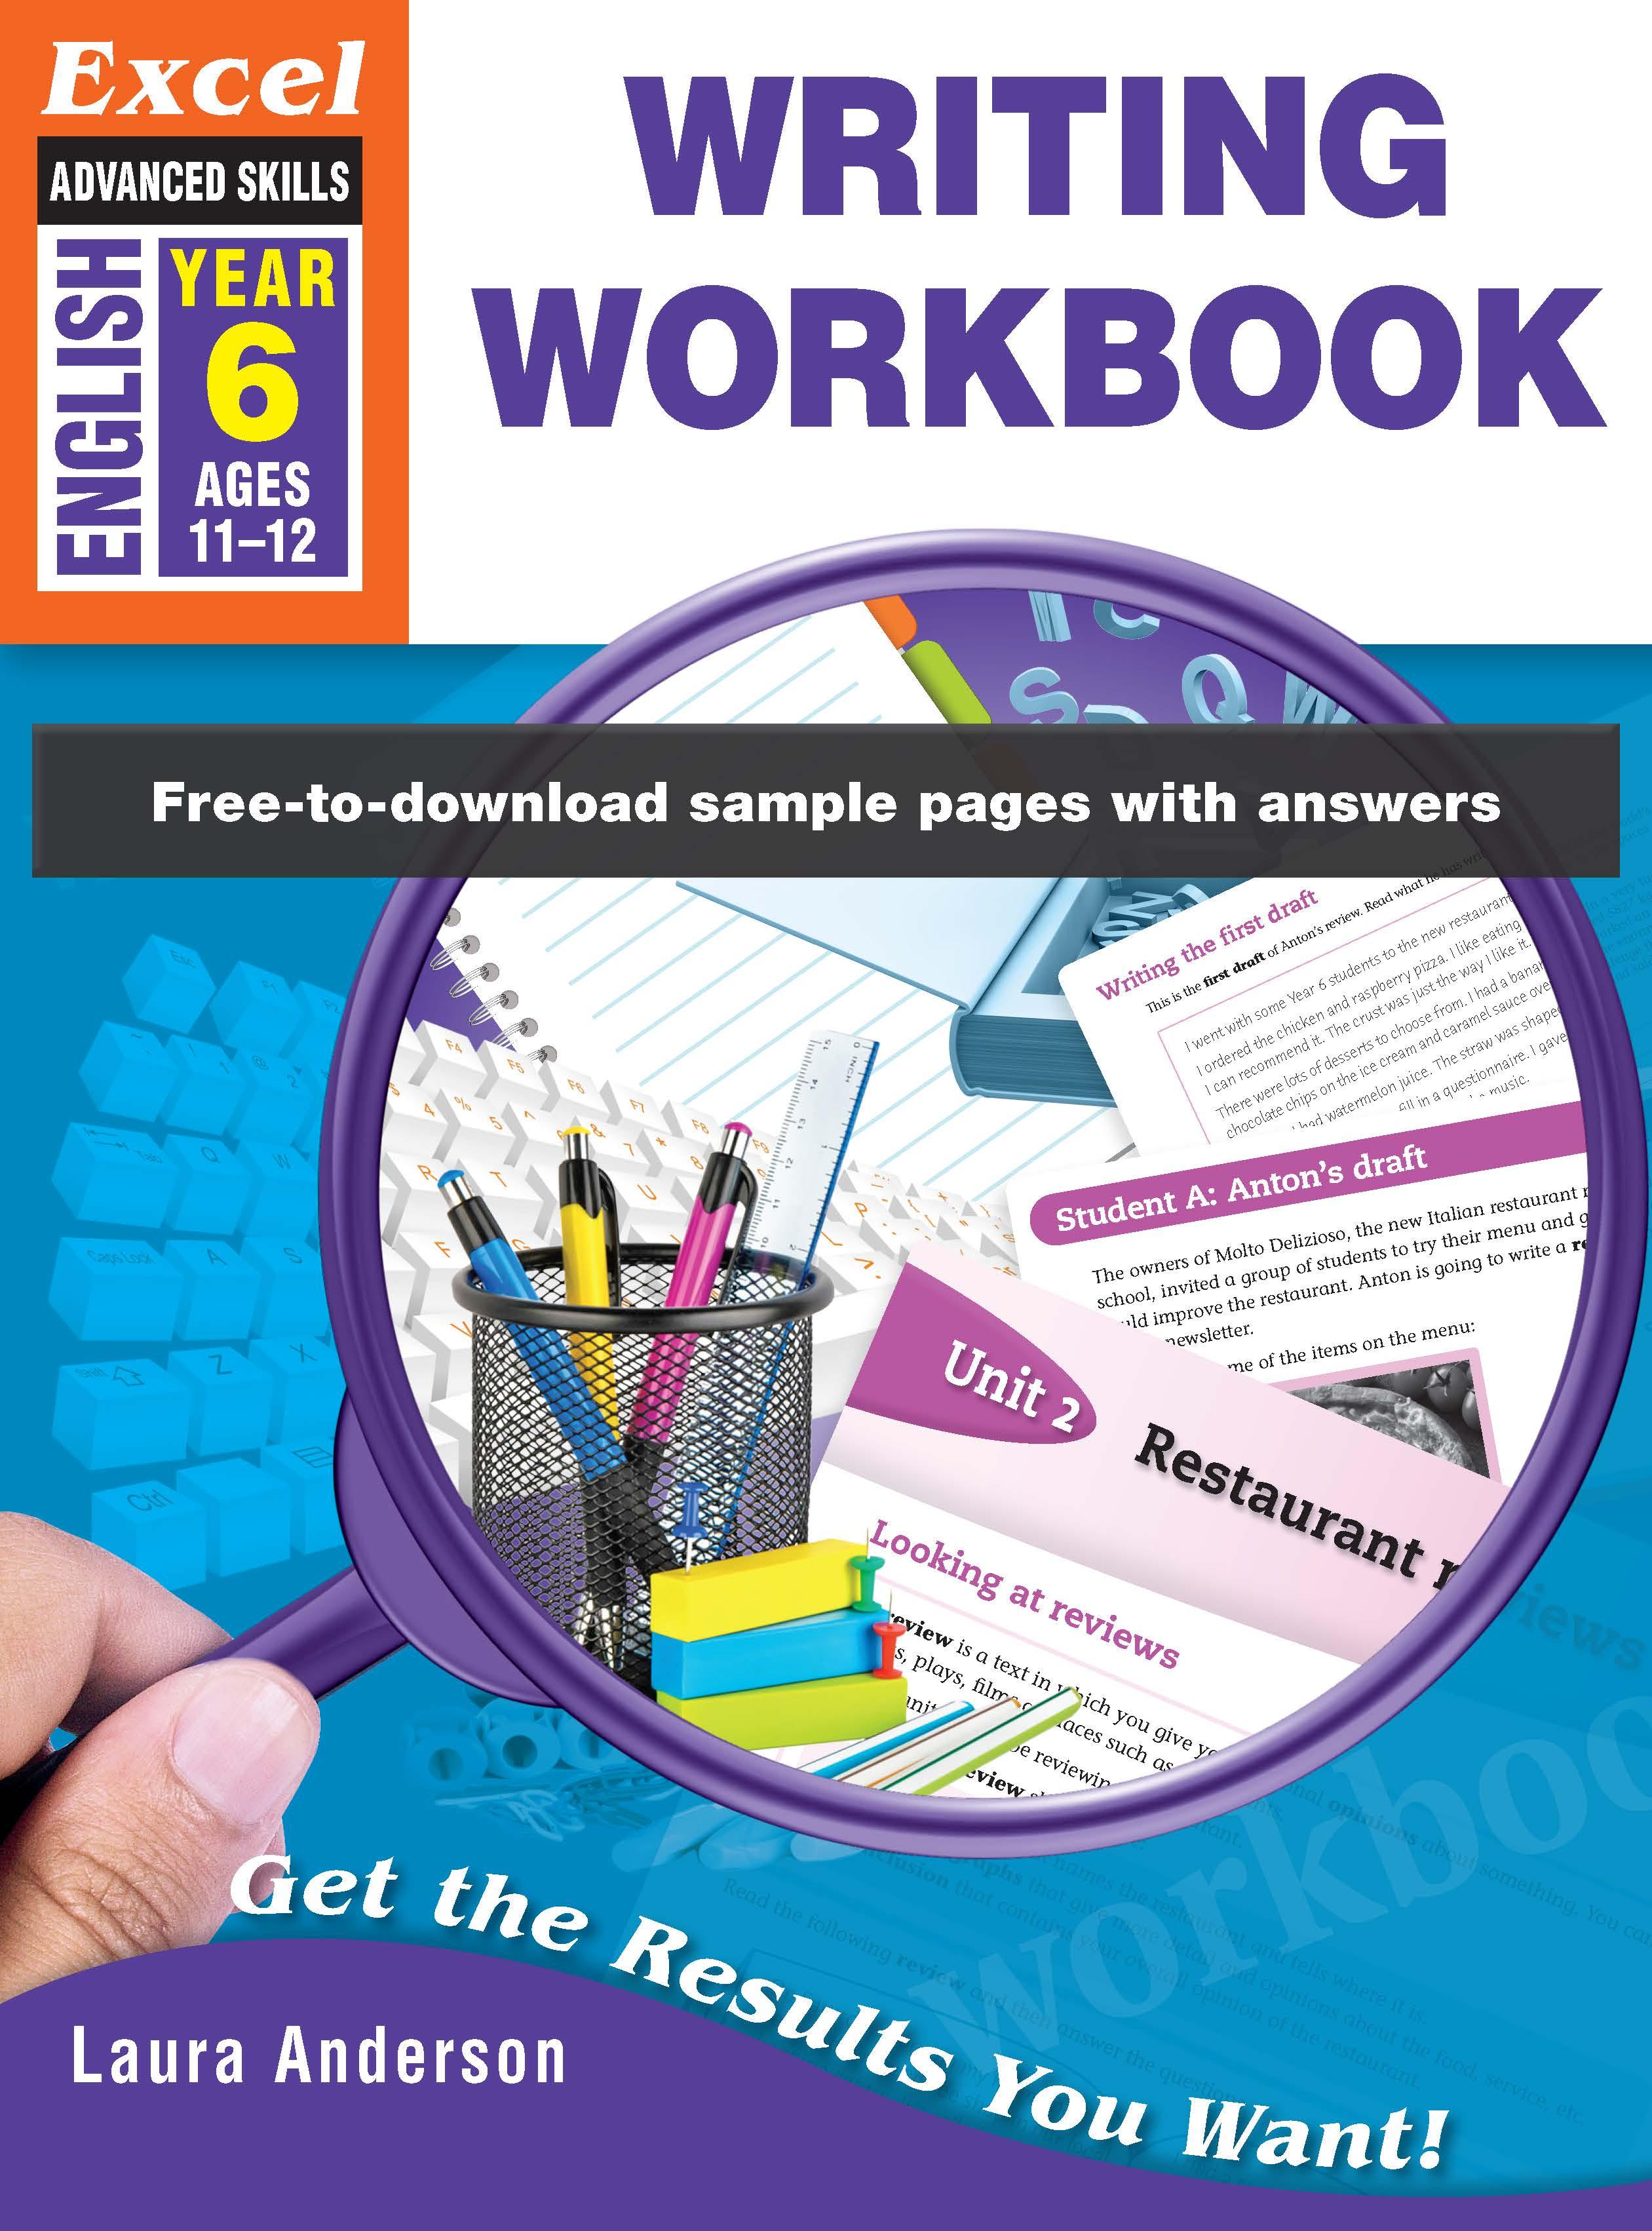 Excel Advanced Skills Writing Workbook Year 6